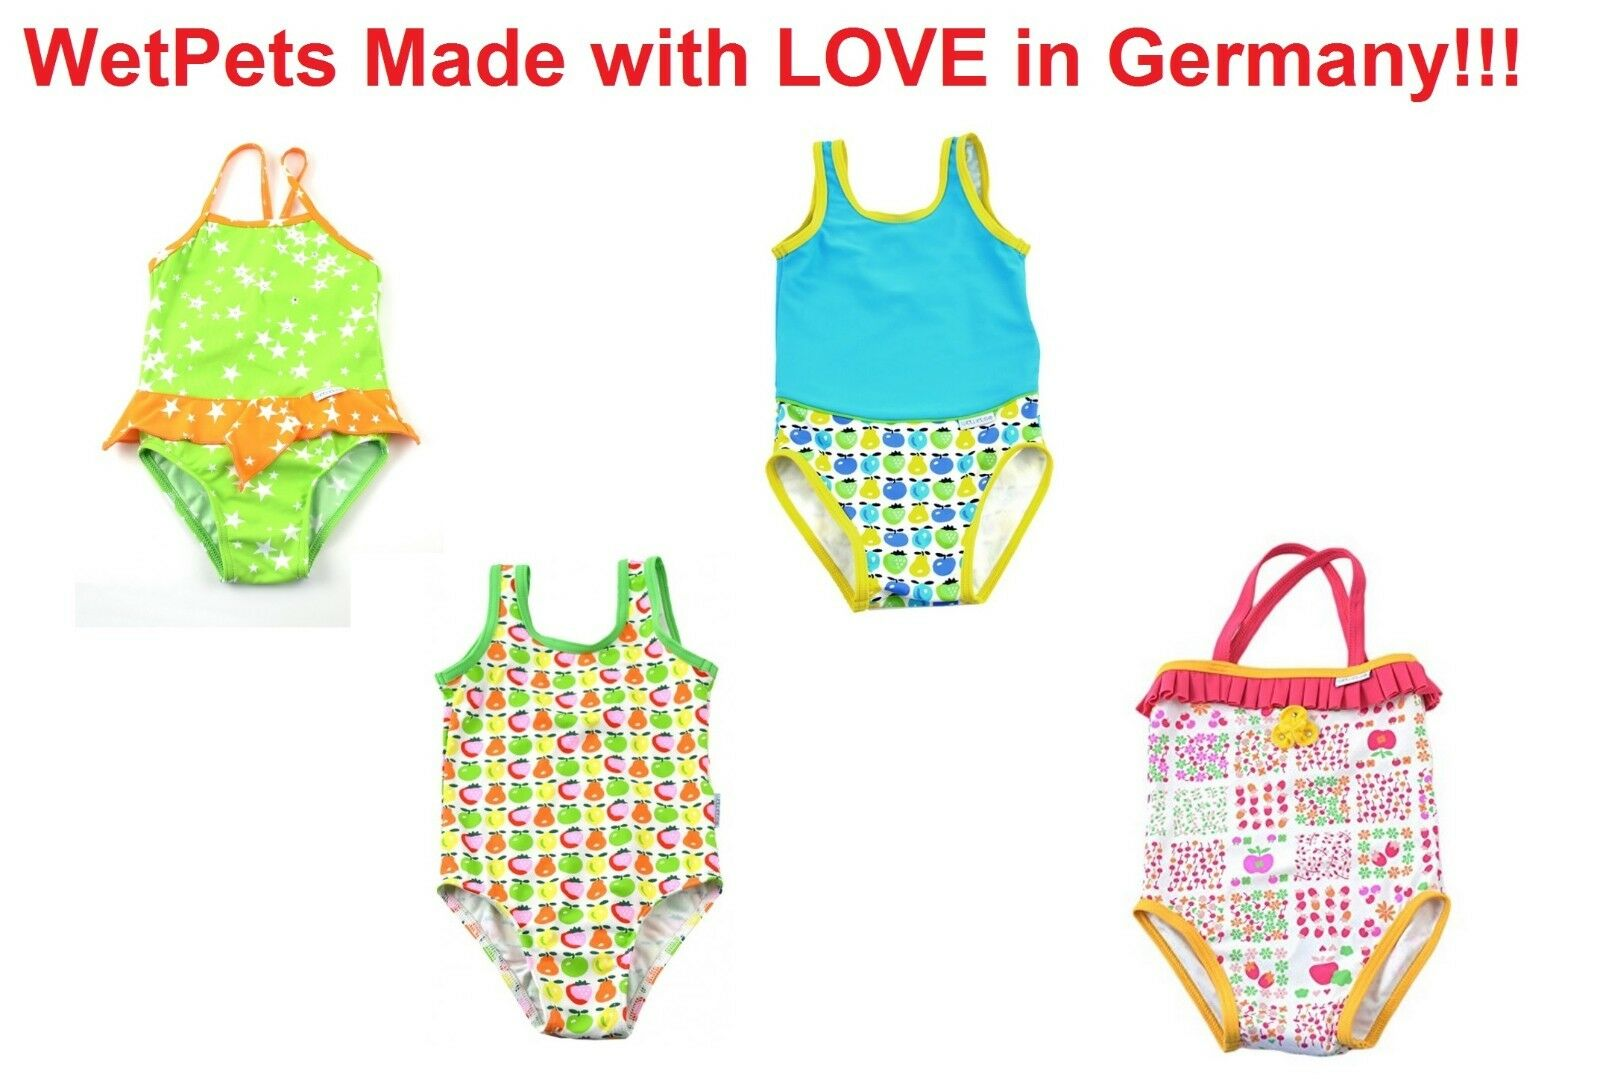 Mädchen Badeanzug Kinder Bikini Gr 62 68  74 80  86 92  98 104  110 116 WetPets